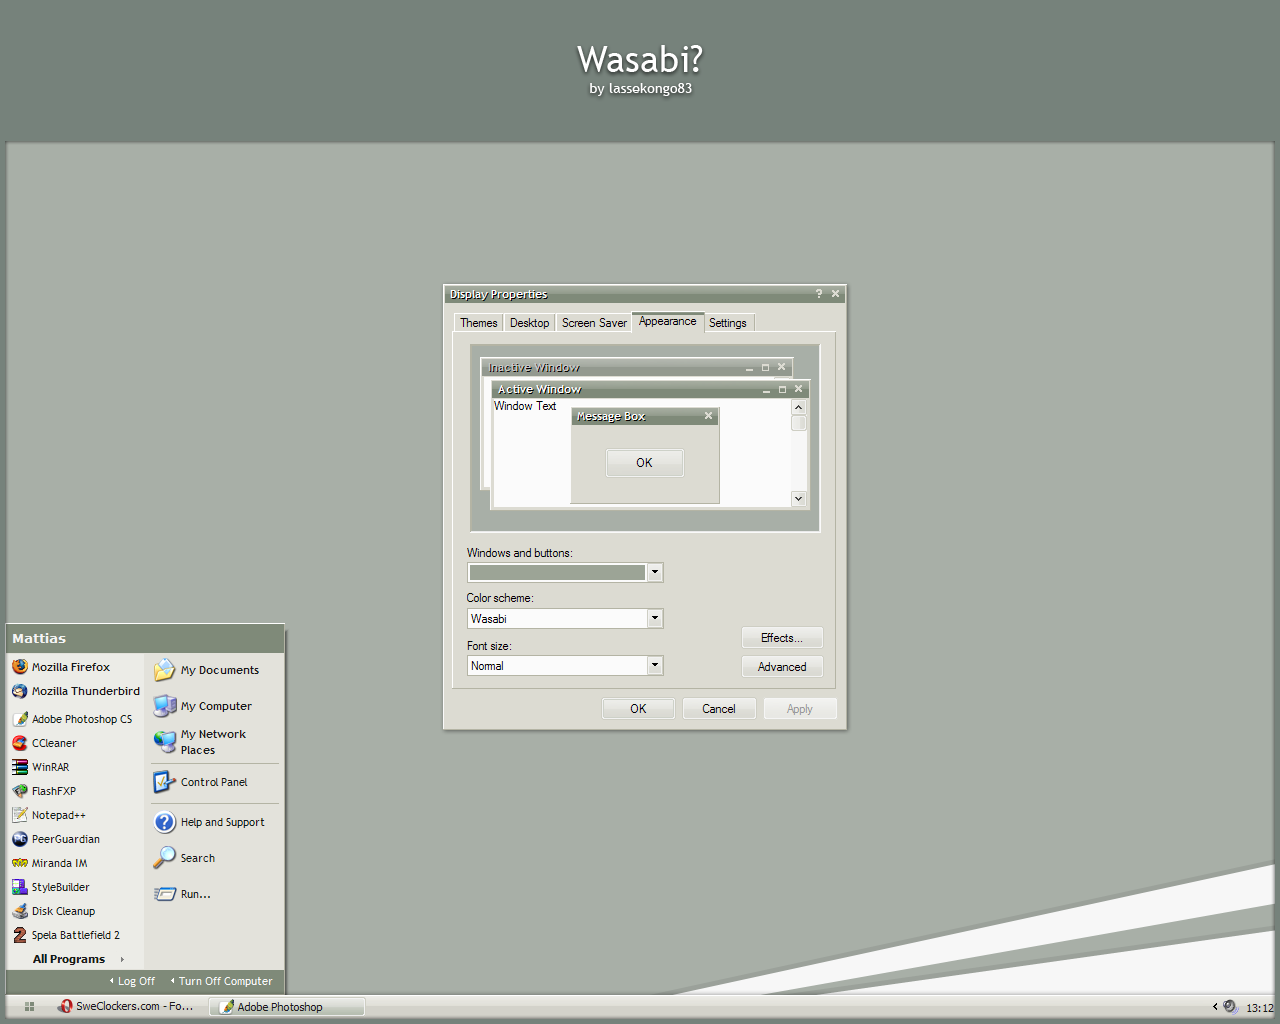 Wasabi? by lassekongo83